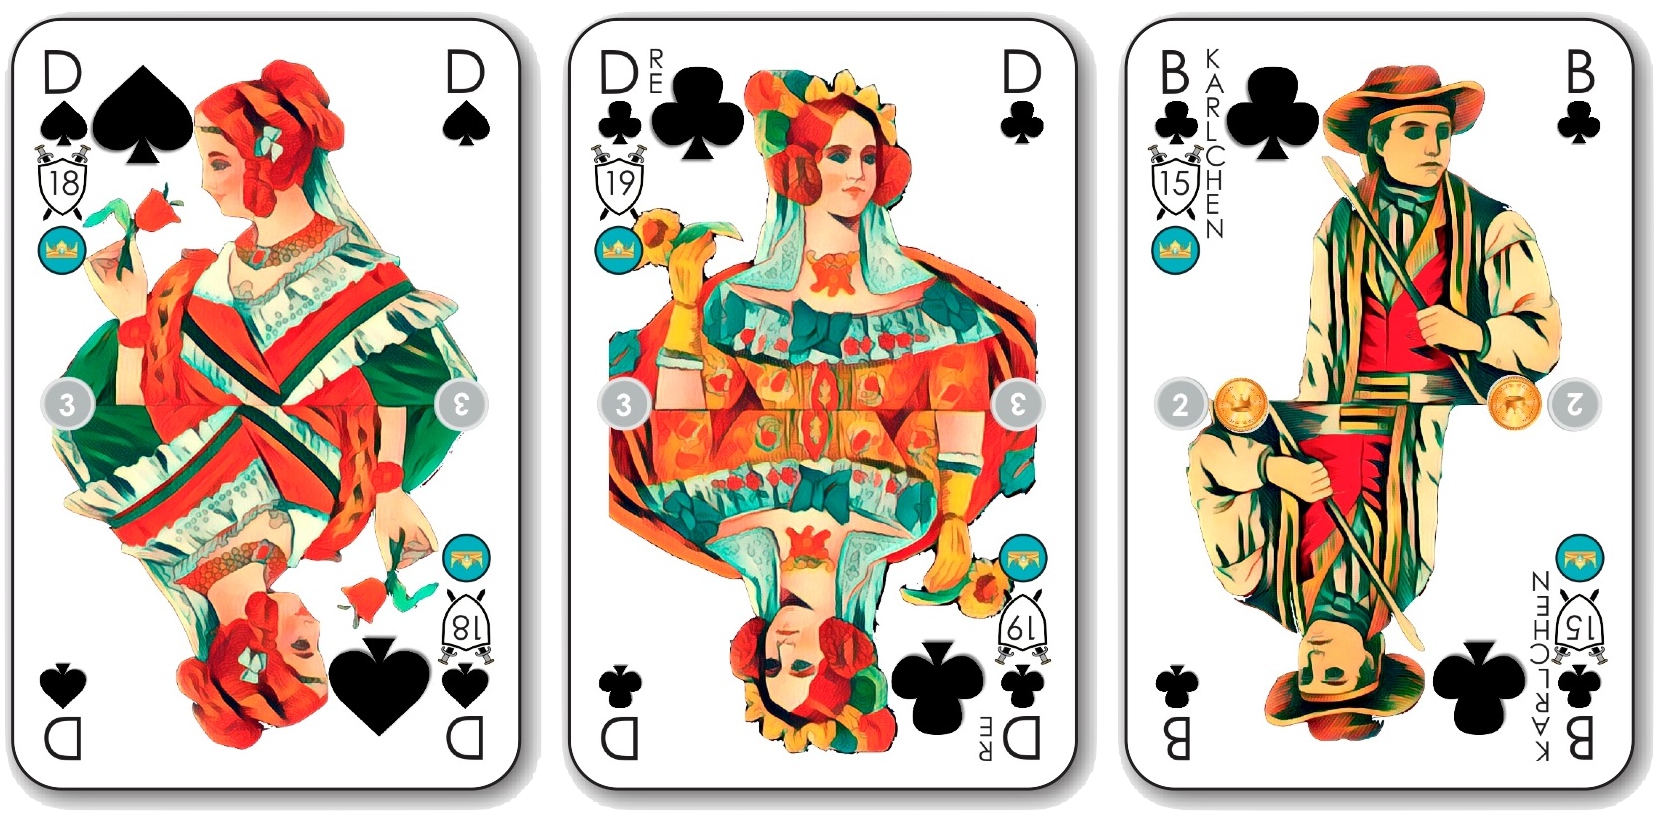 Doppelkopf Kartenspiel – Der Spieleklassiker neu gedacht